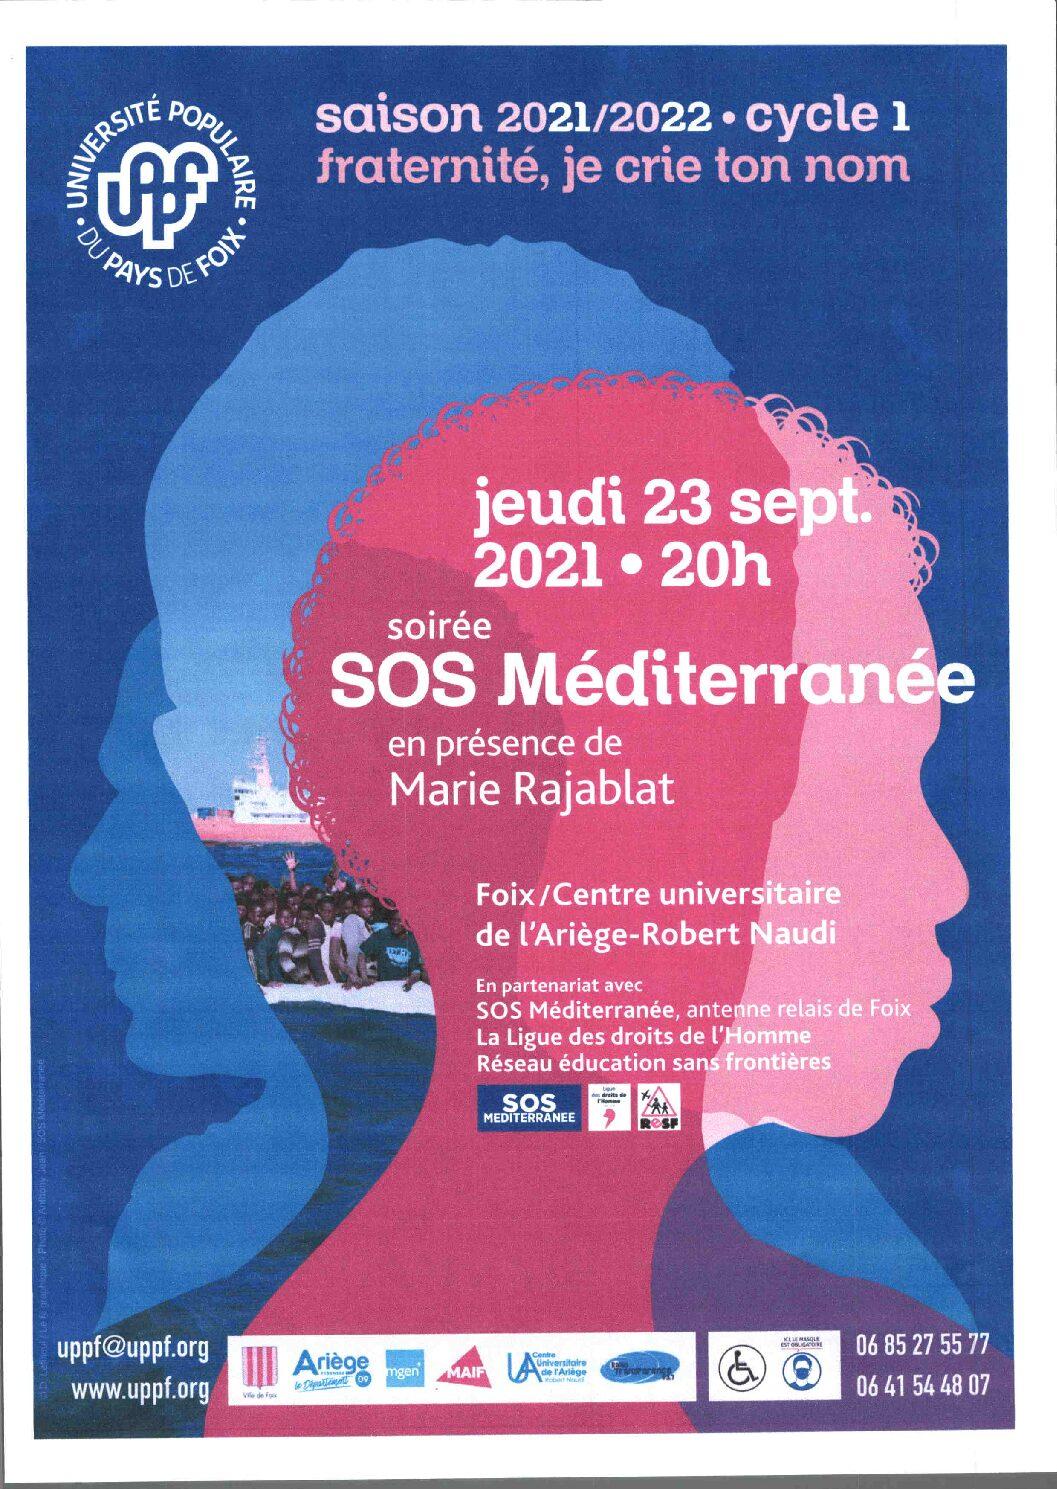 Soirée SOS Méditerranée